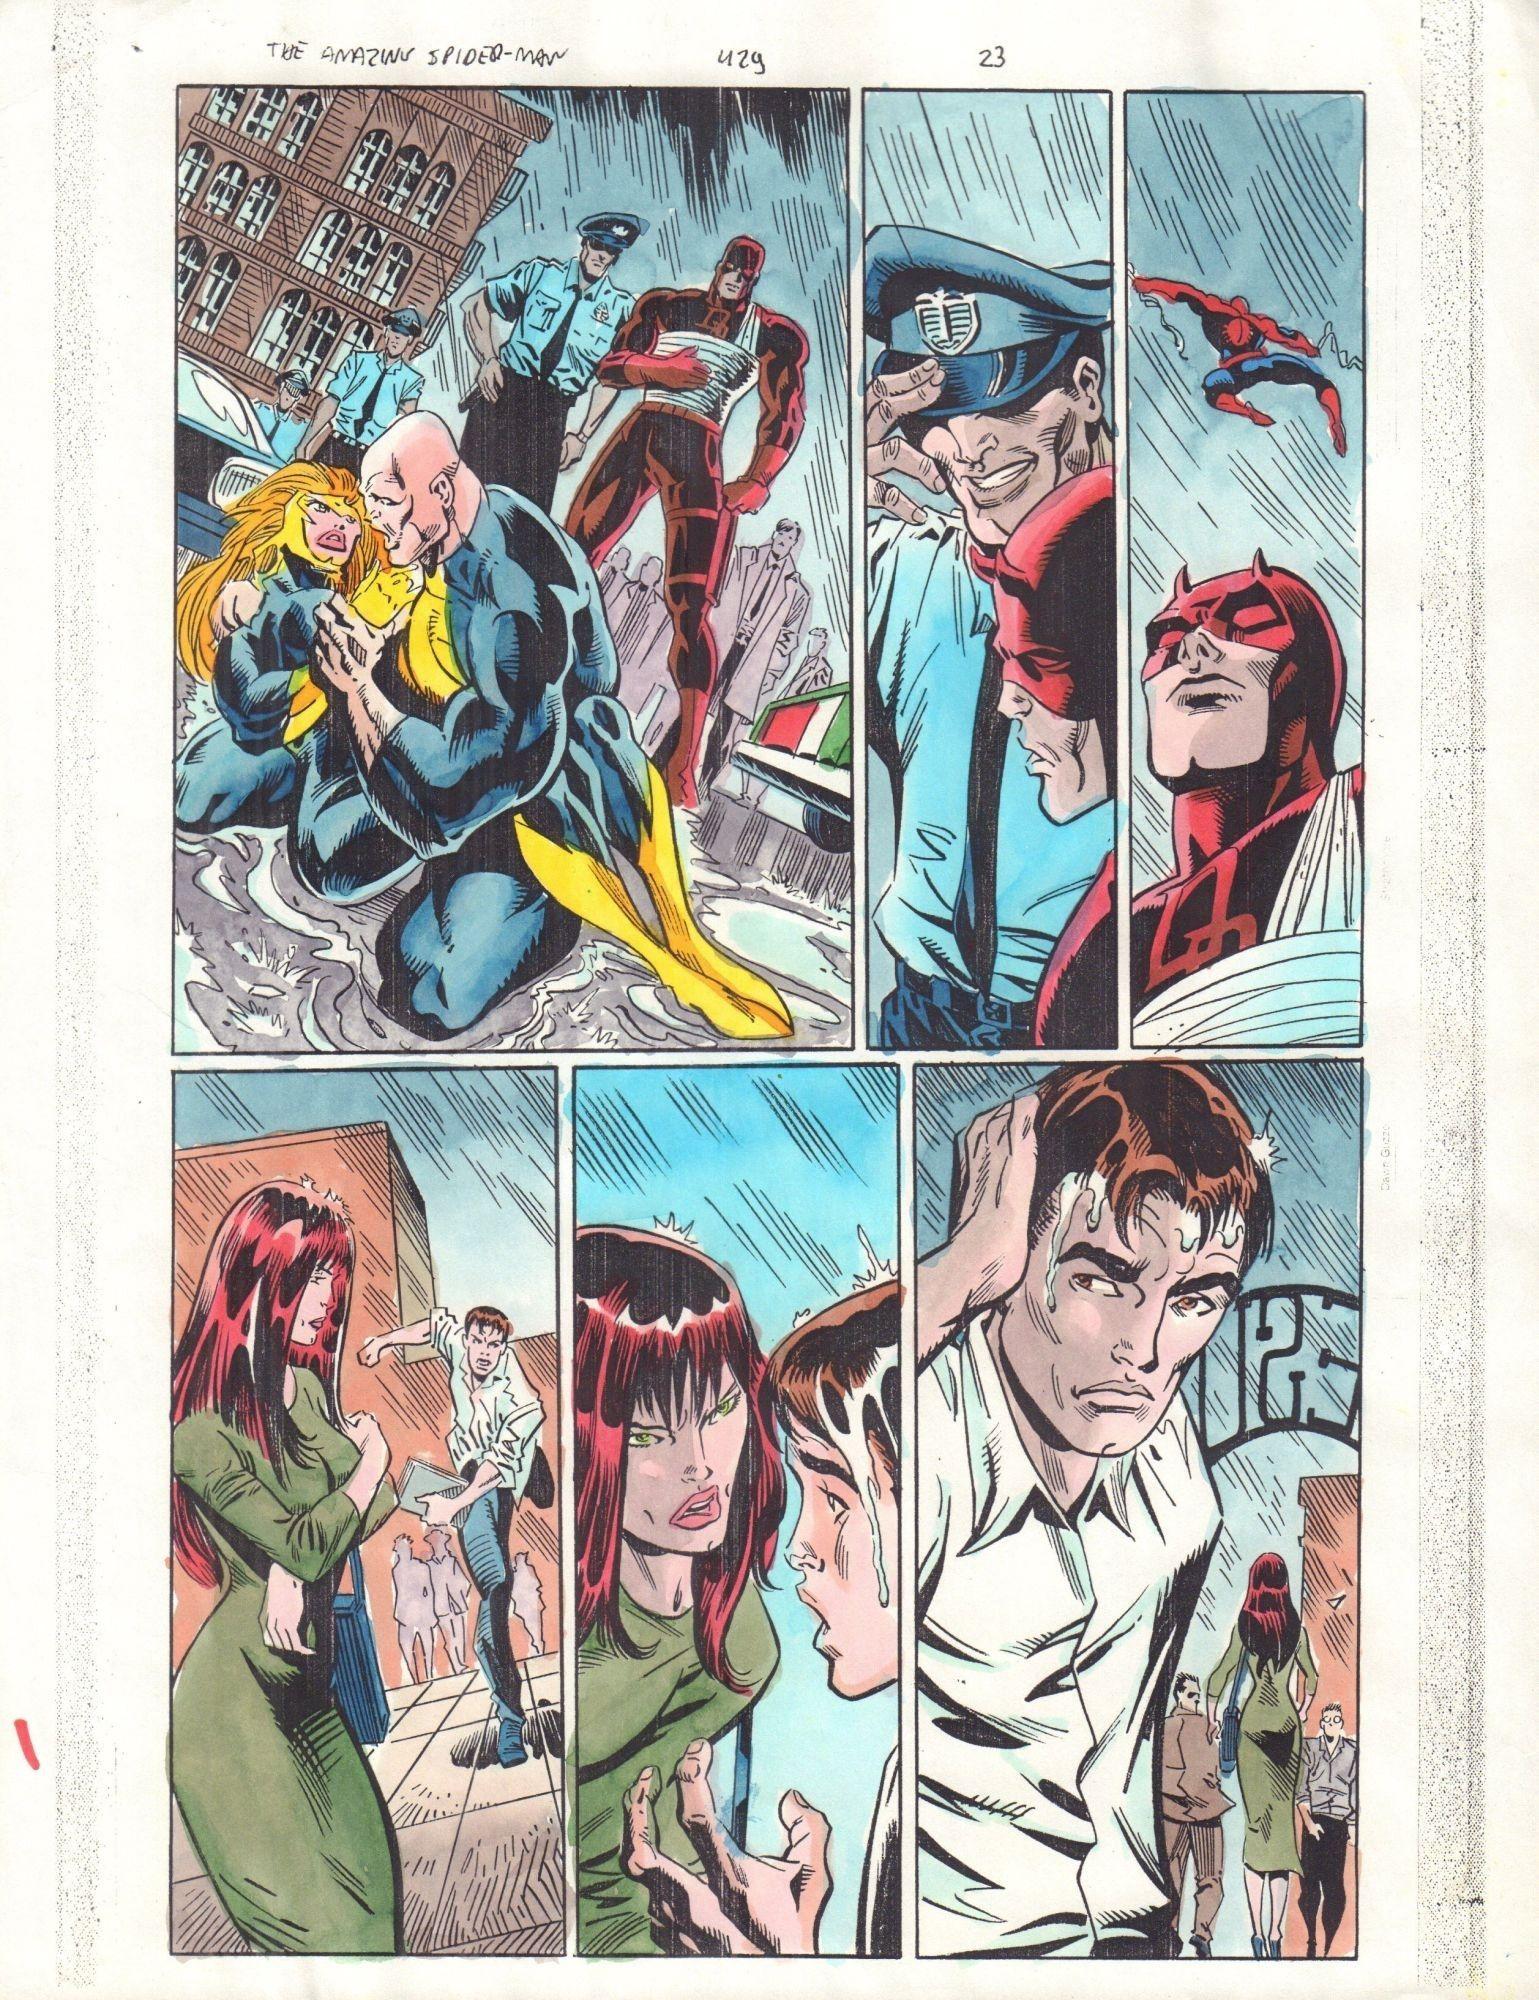 The Amazing Spider-Man #429 / 23